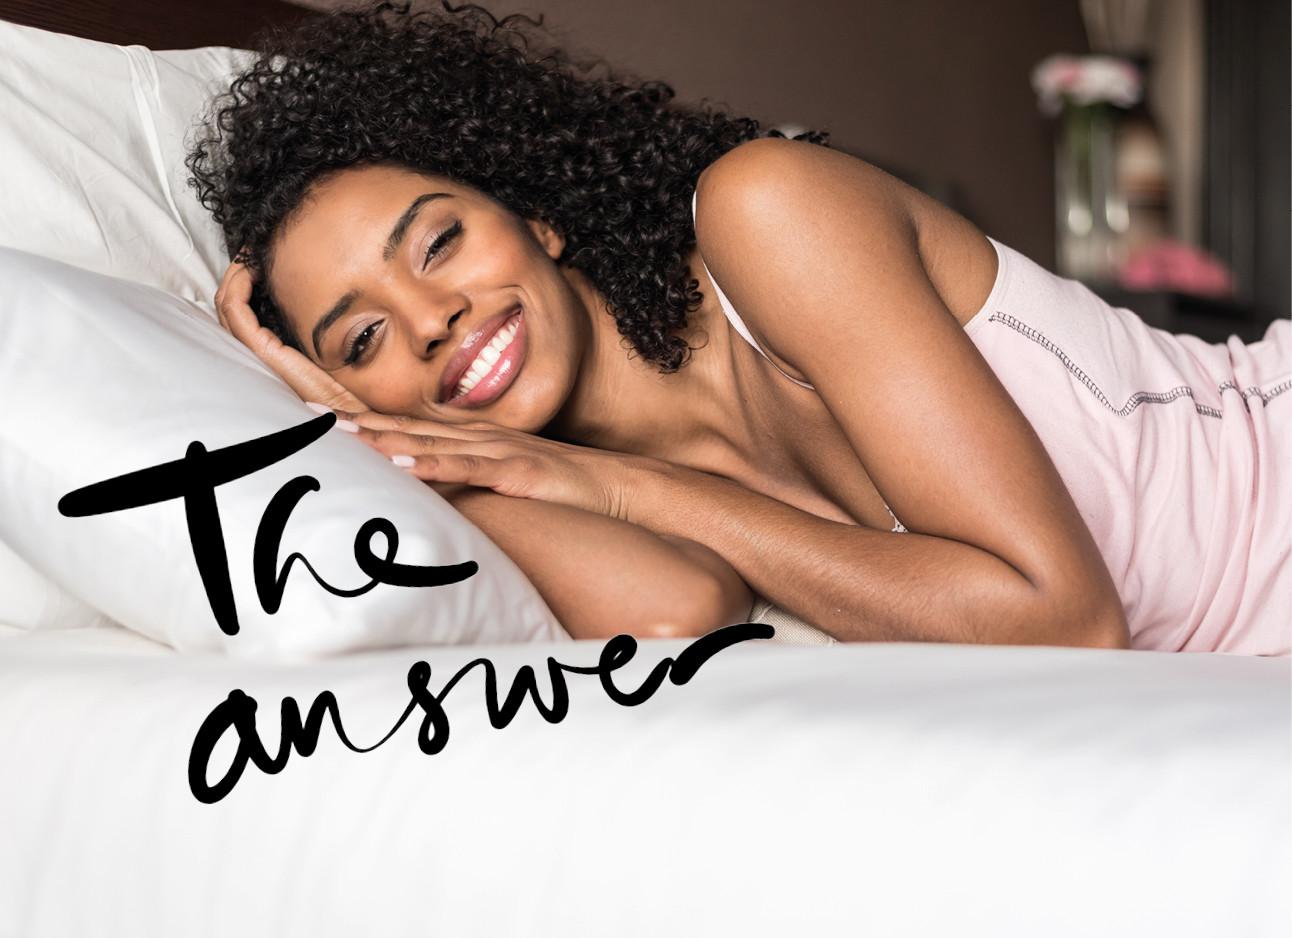 vrouw in bed lekker slapen